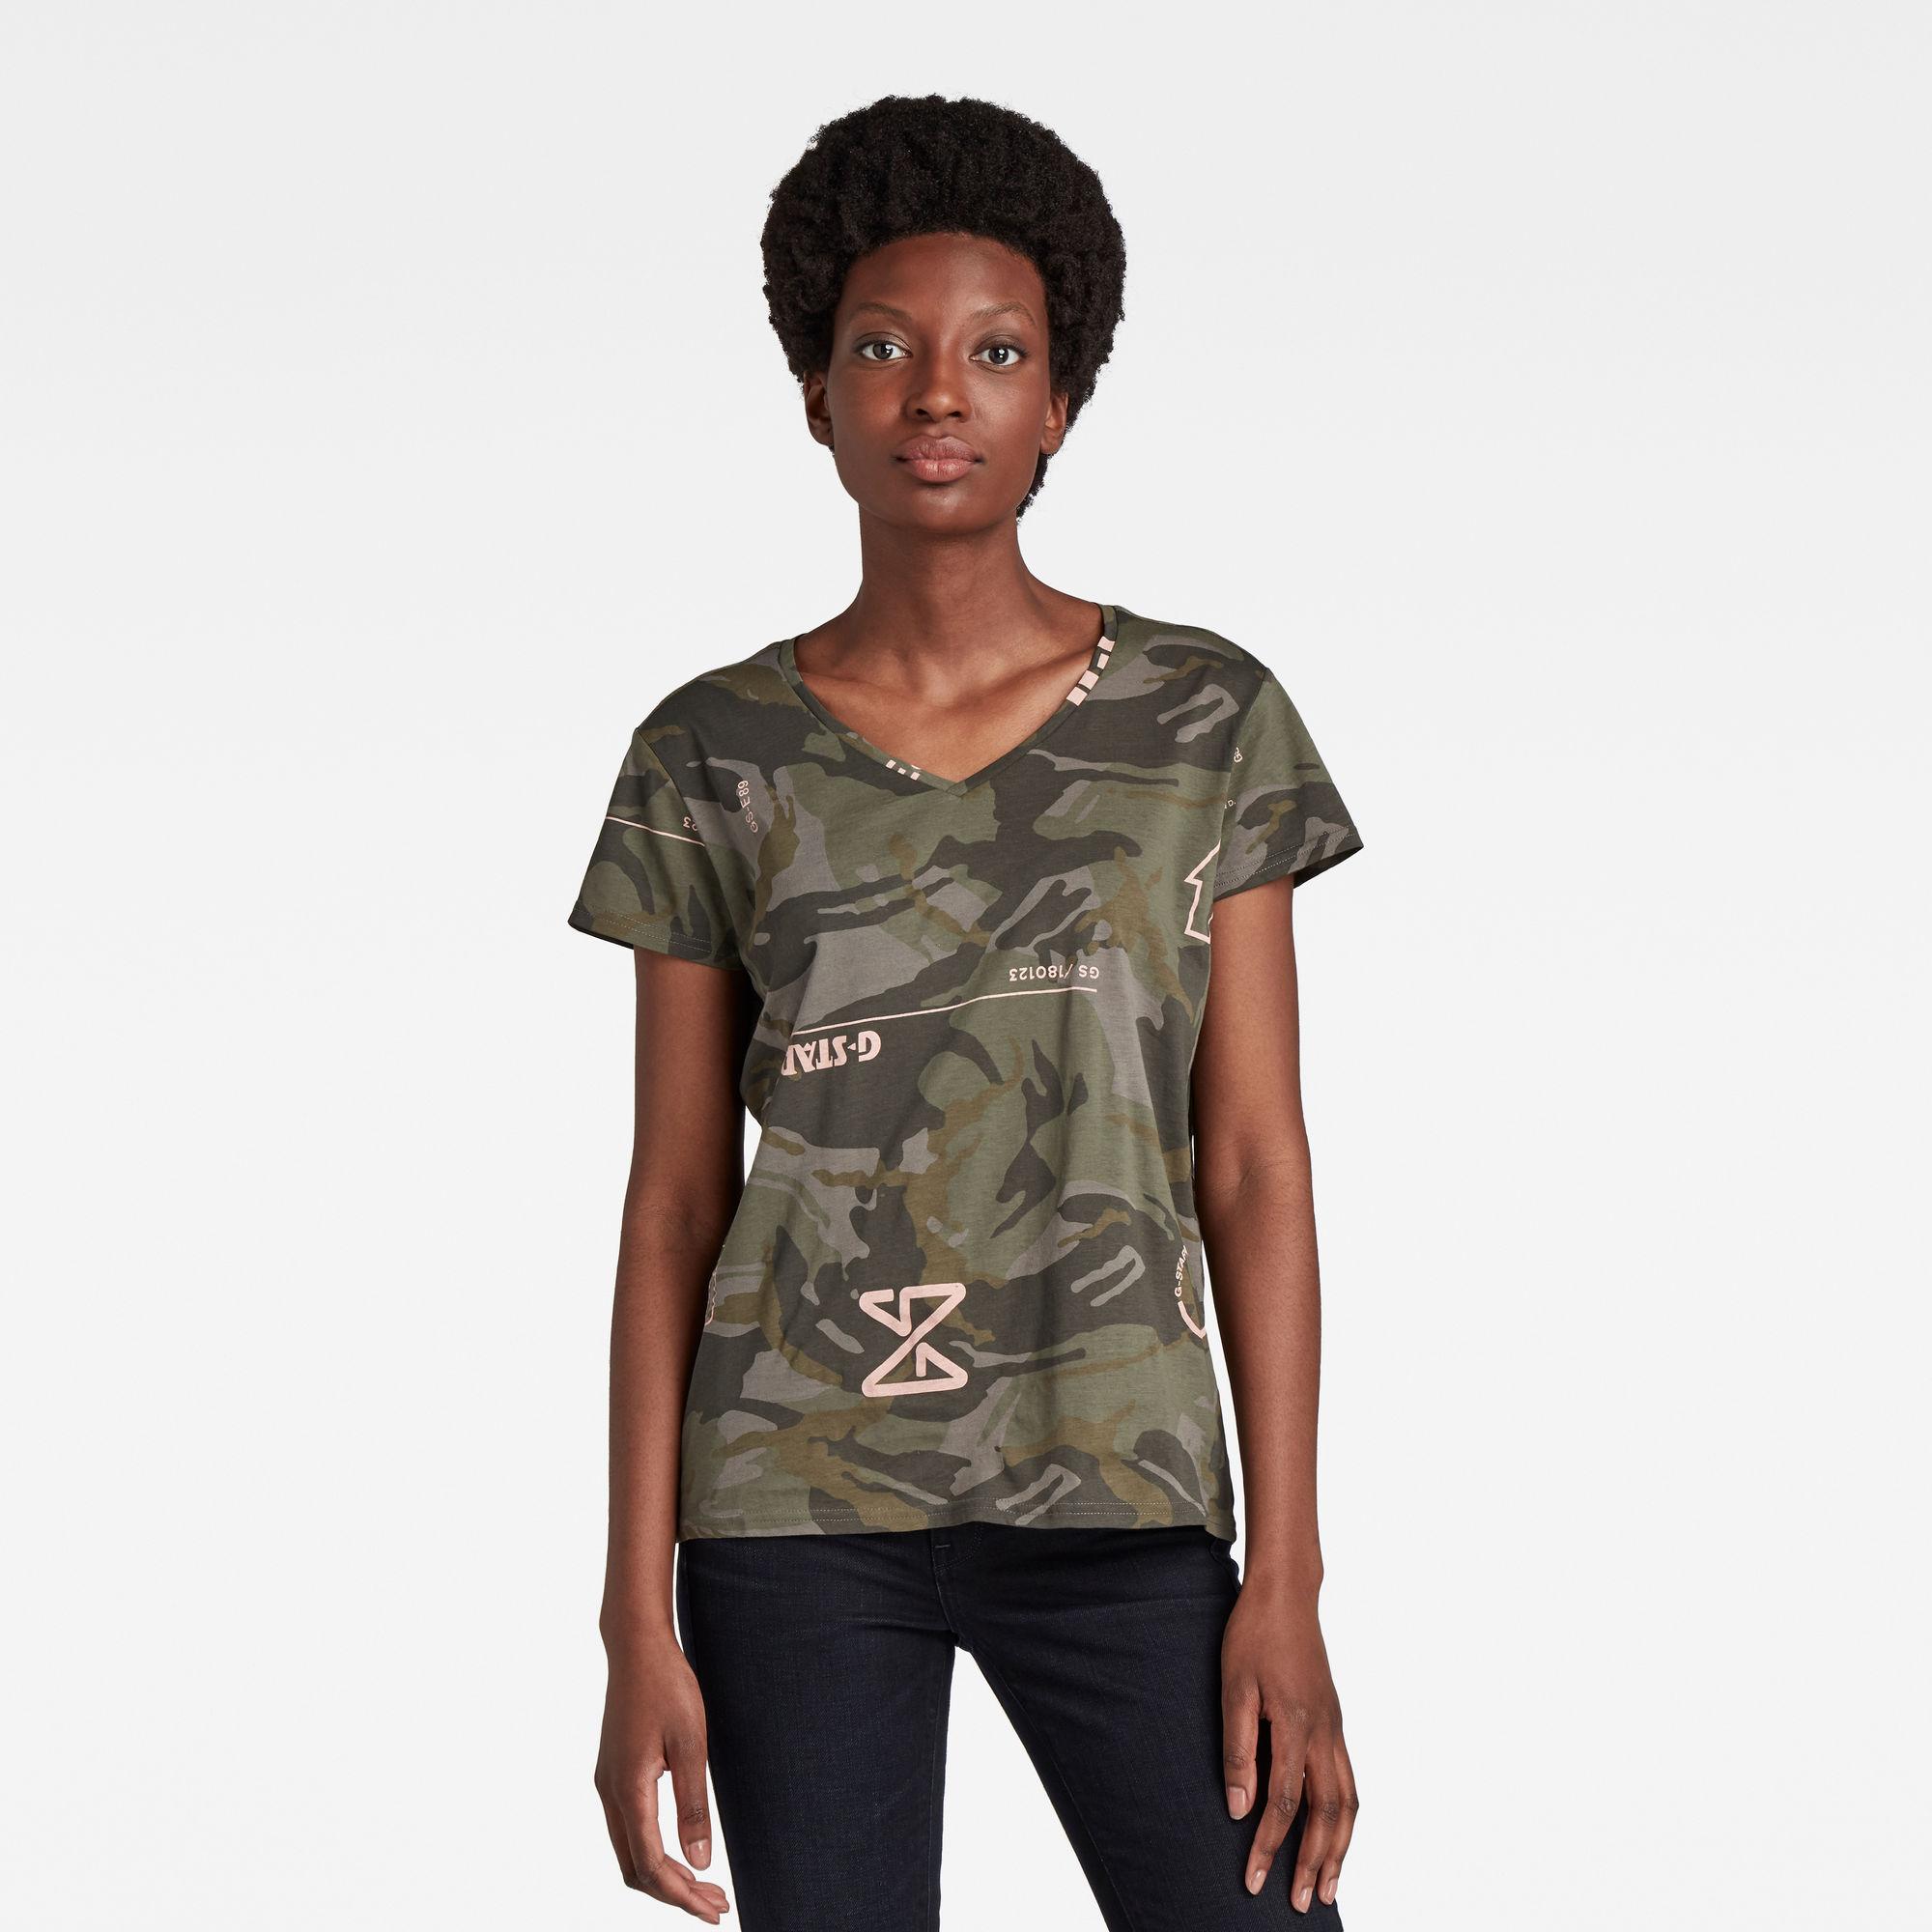 G-Star RAW Dames V-Hals T-Shirt Camo Type Print Meerkleurig